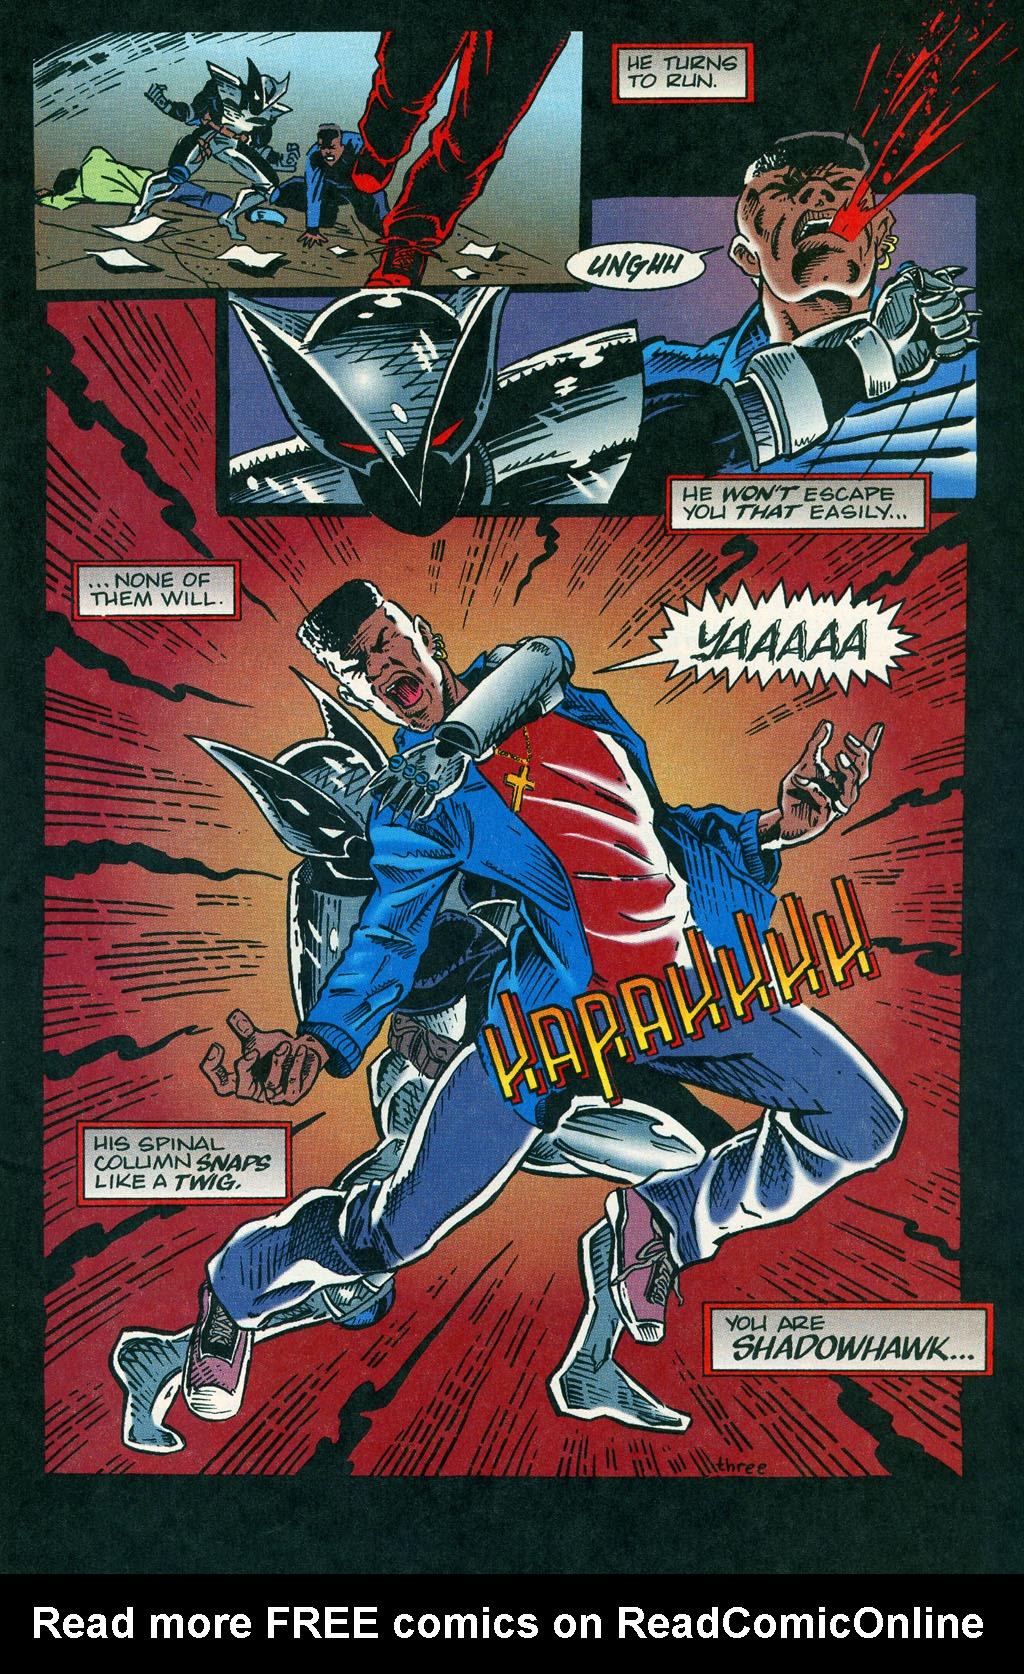 Read online ShadowHawk comic -  Issue #1 - 6